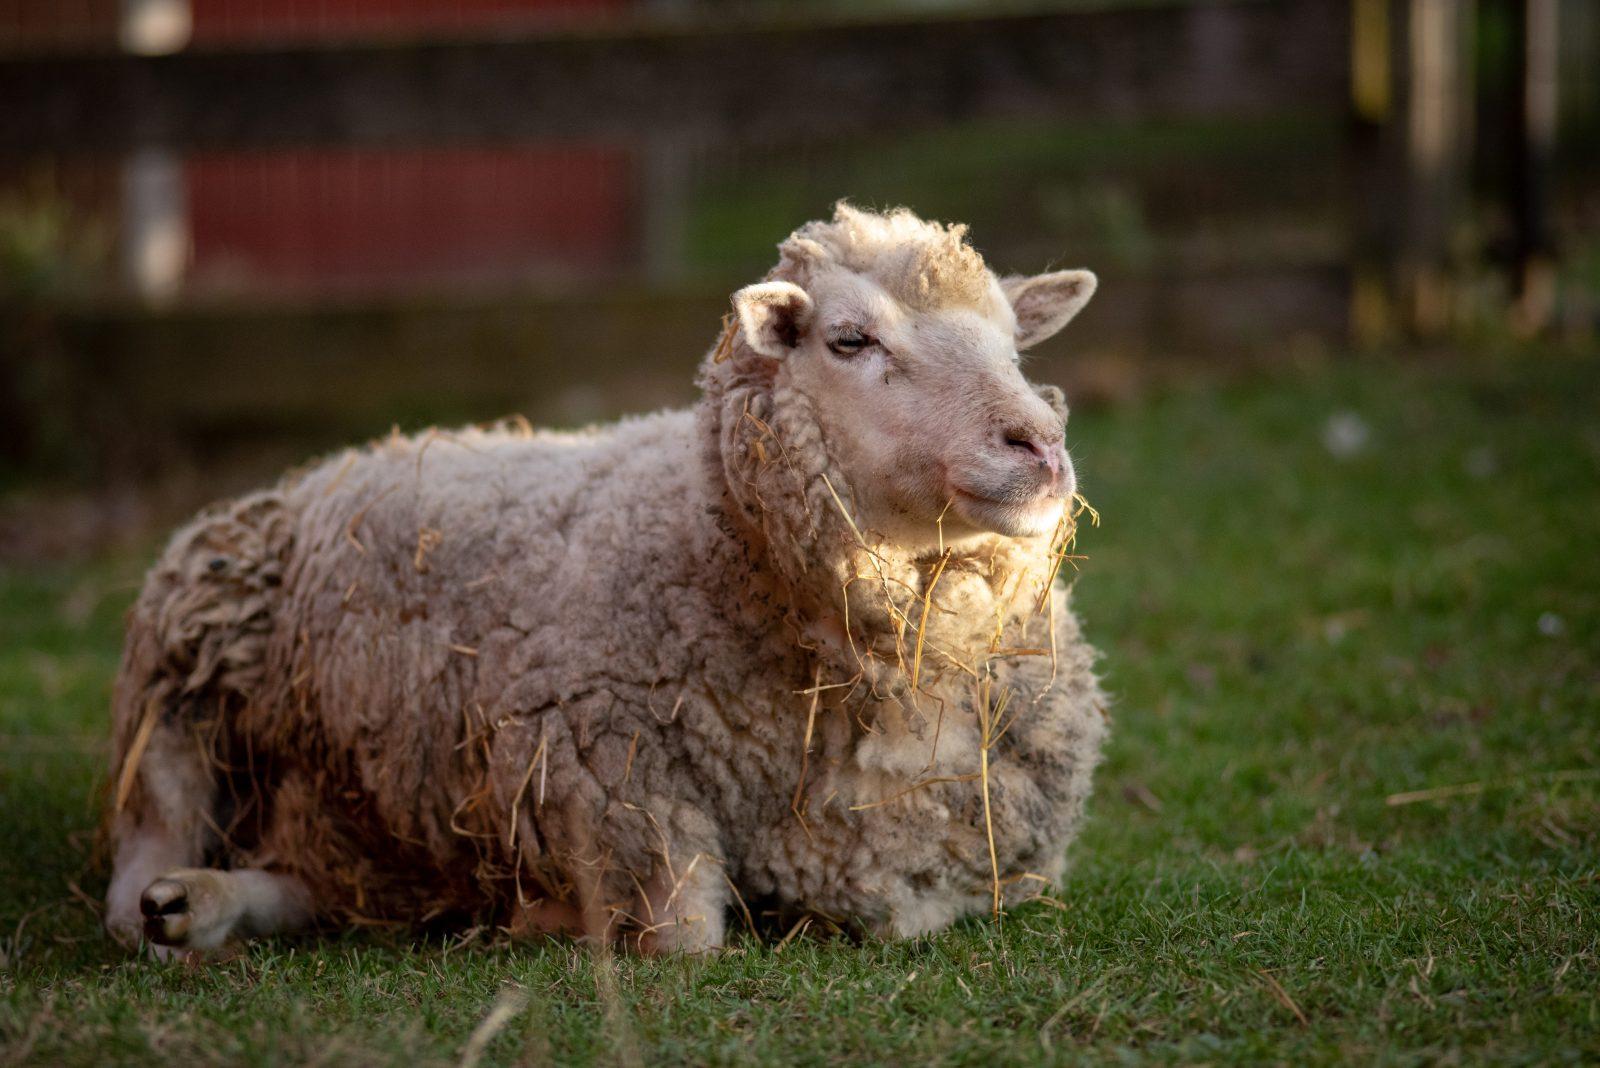 Smudge sheep at Farm Sanctuary